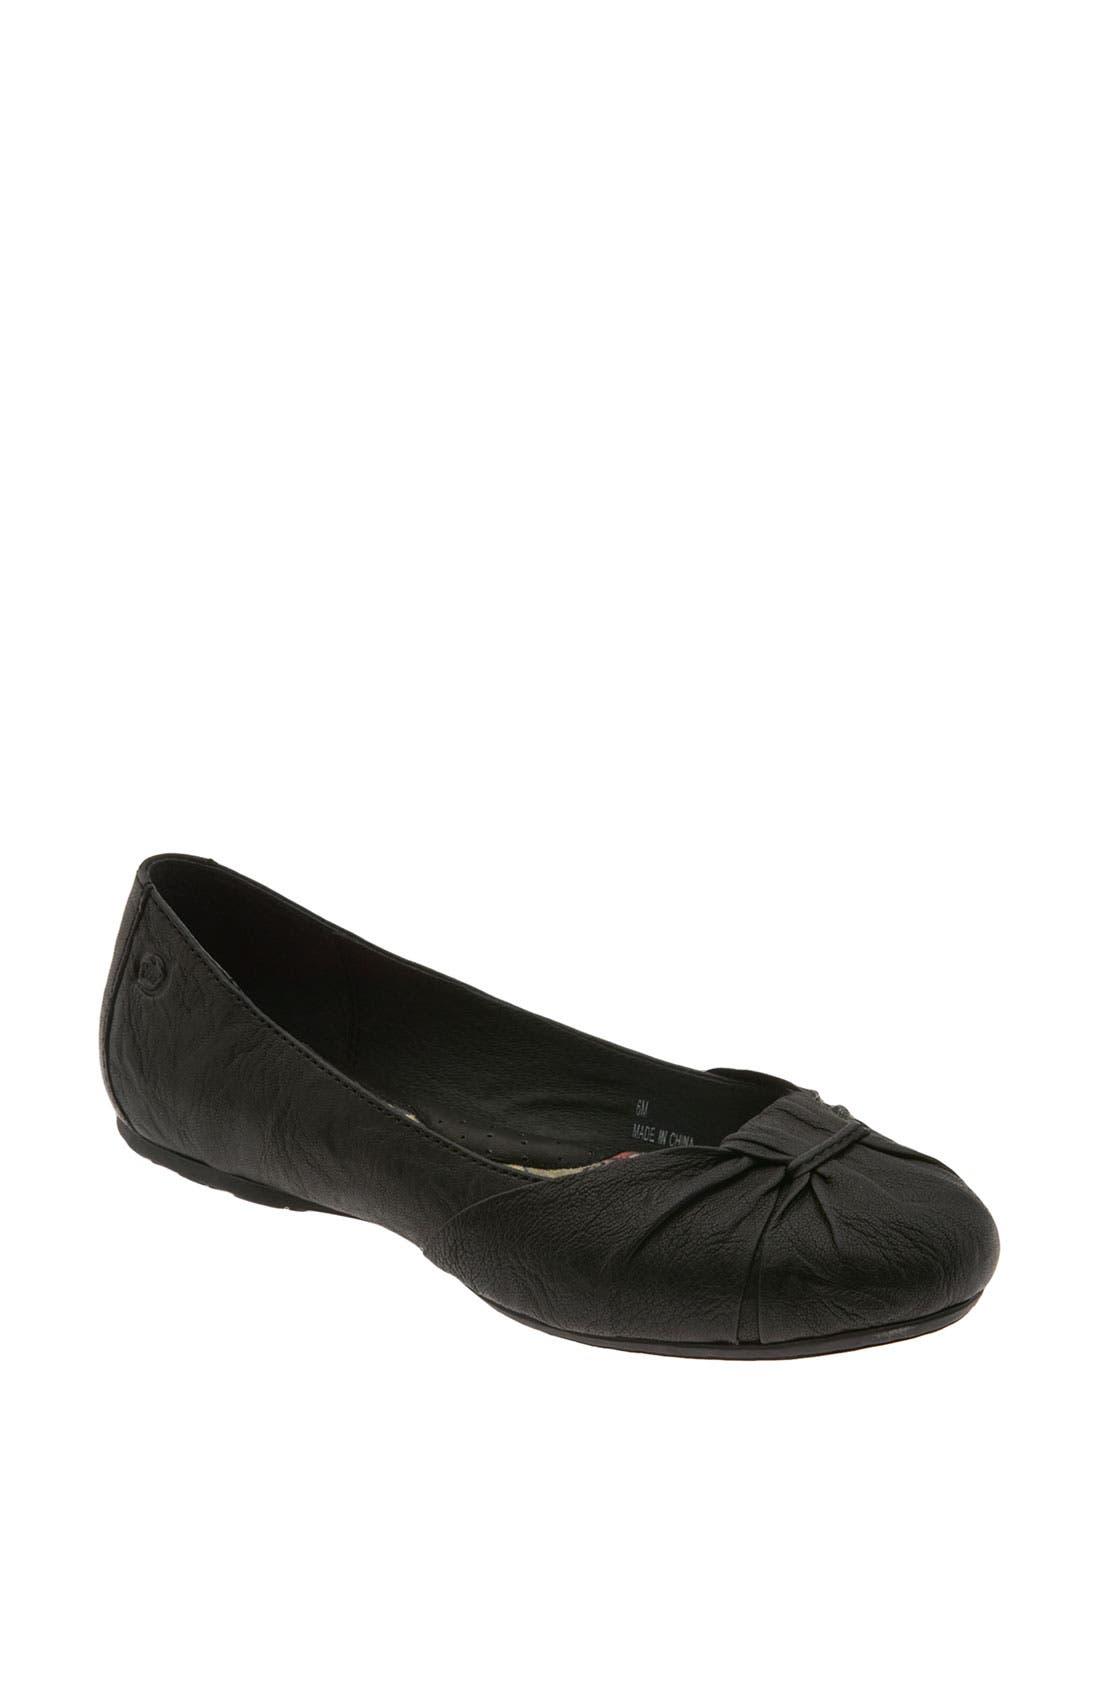 'Adele' Flat,                         Main,                         color, Black